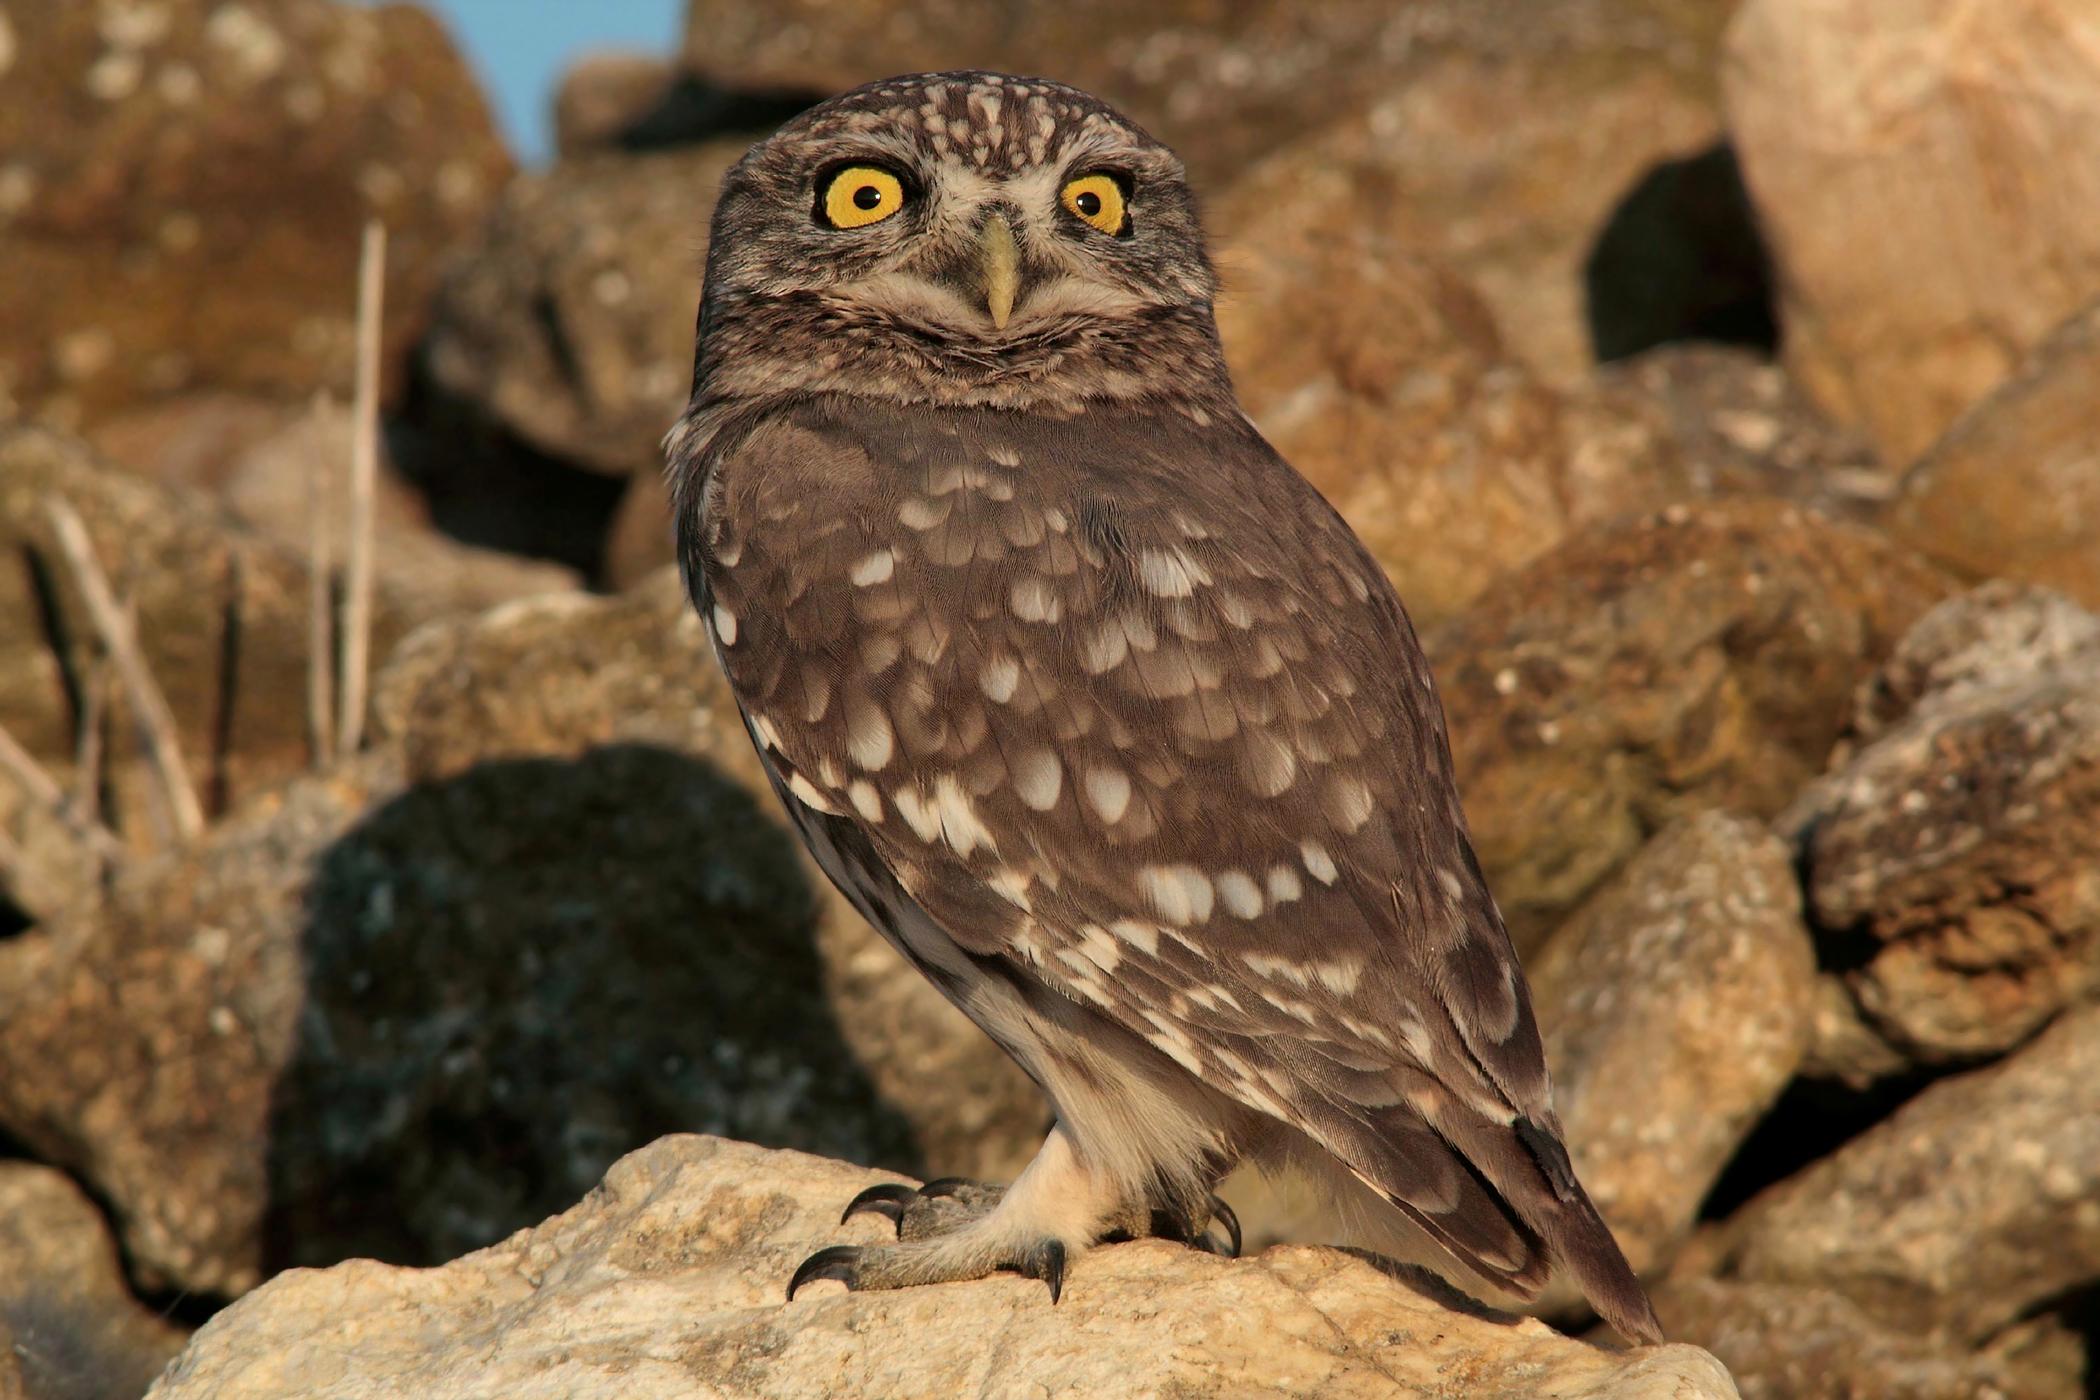 The owl alert...